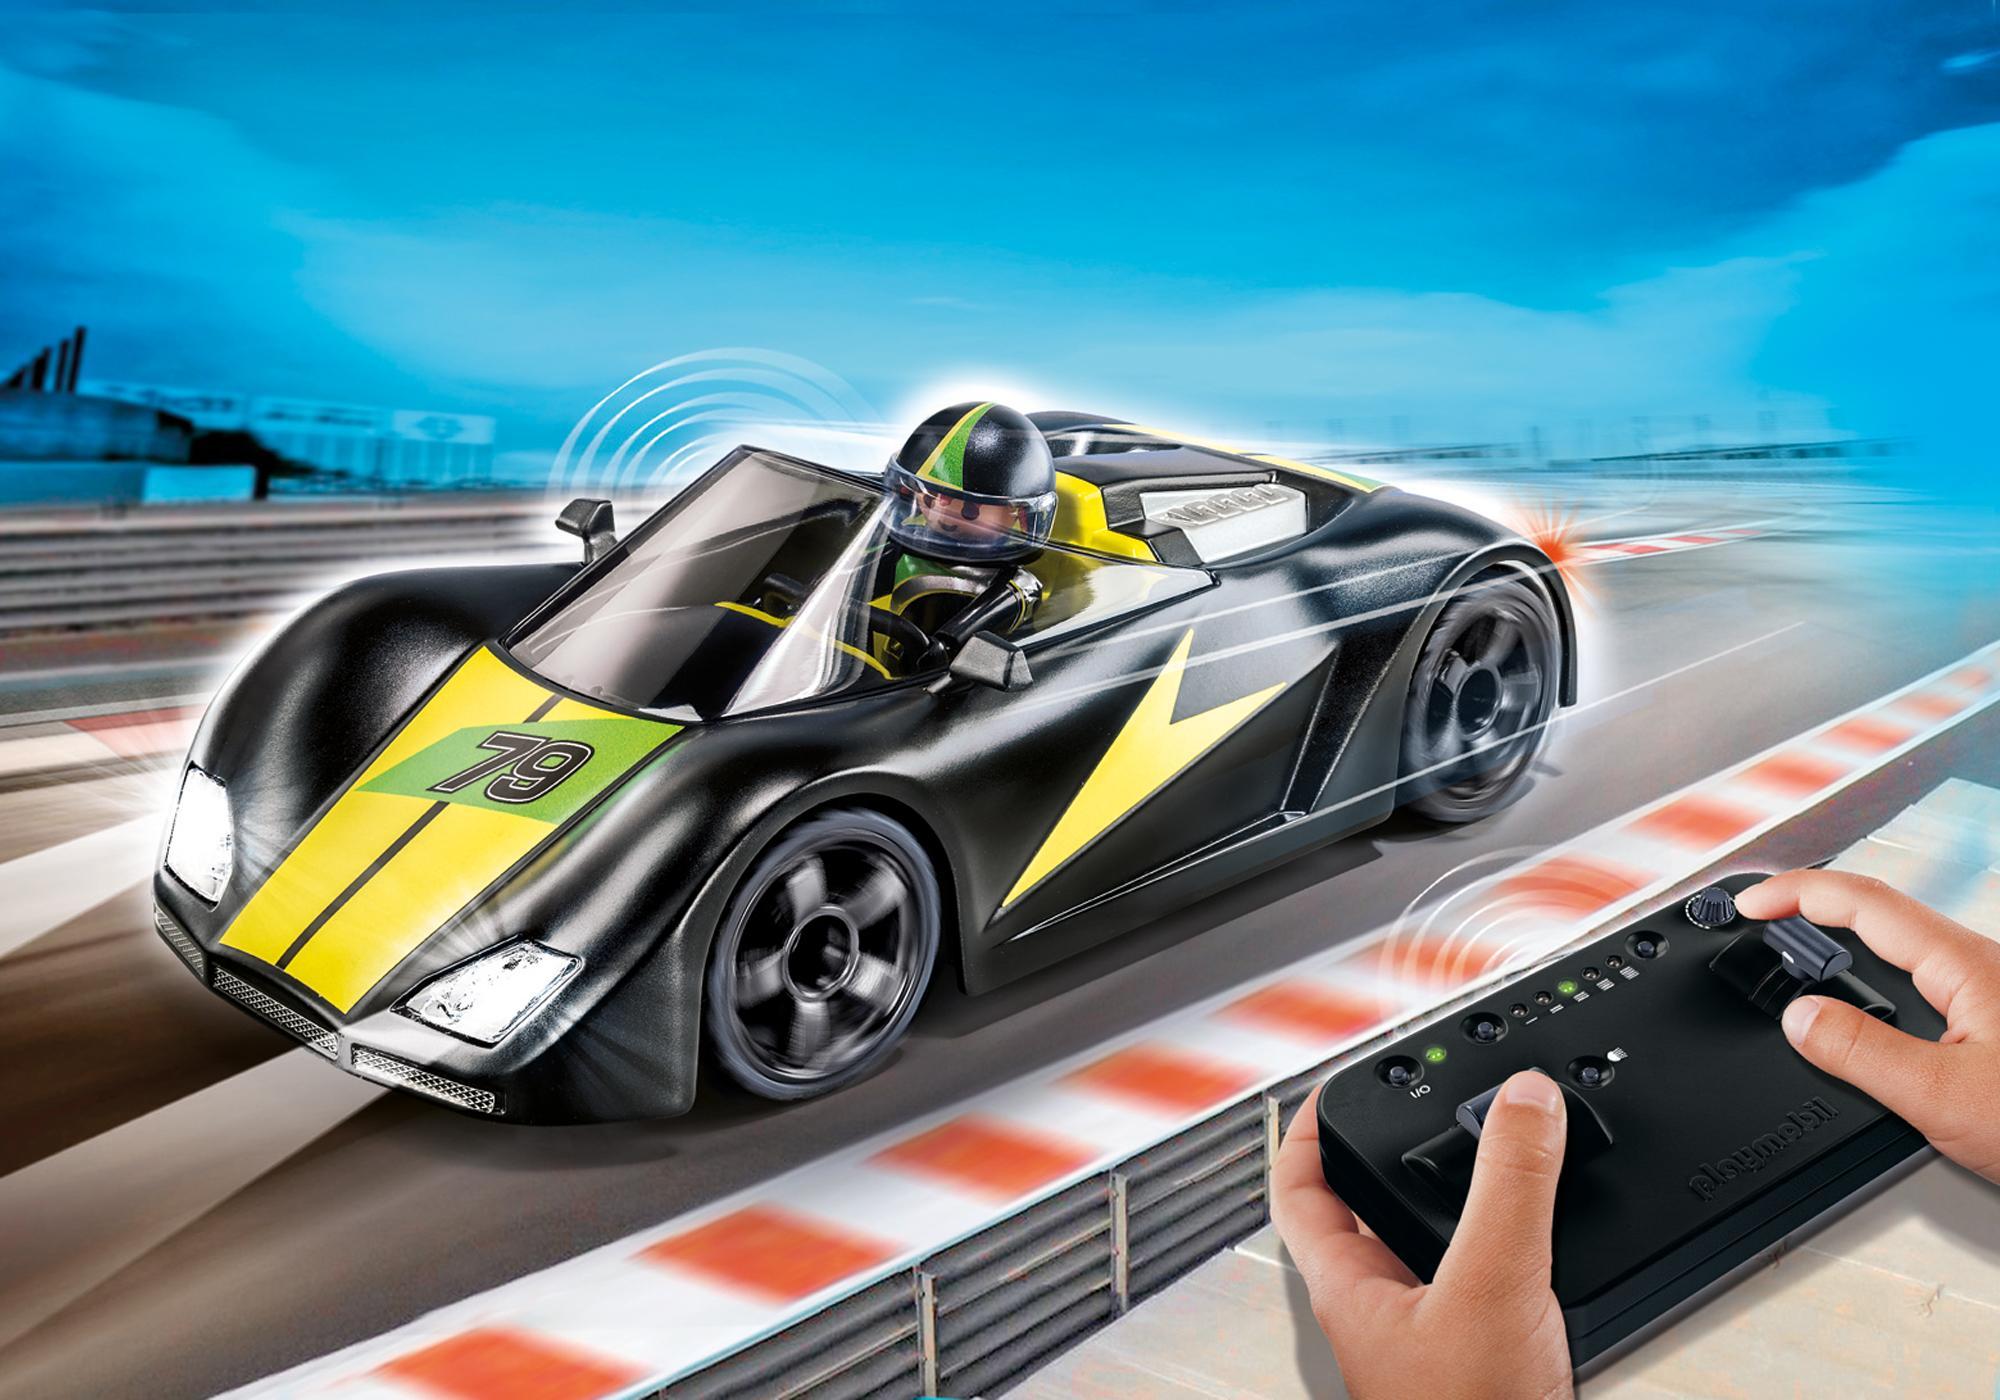 http://media.playmobil.com/i/playmobil/9089_product_detail/RC-Supersport-Racer